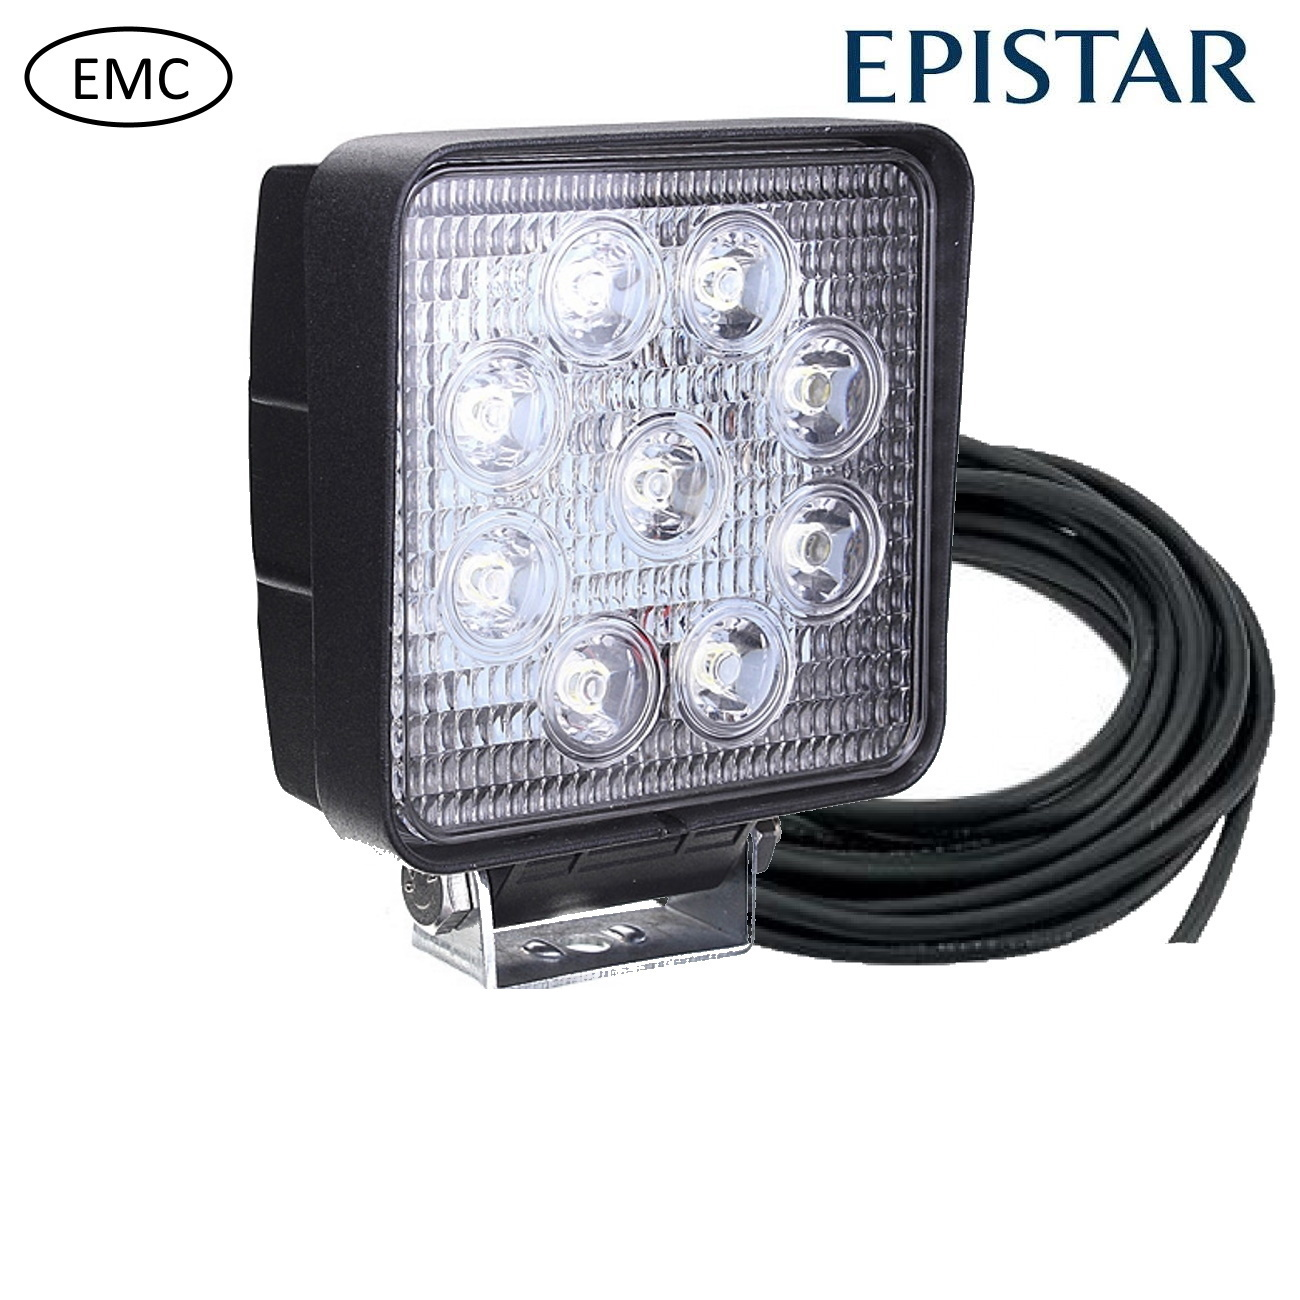 27 watt werklamp EMC M-LED (4 meter kabel)